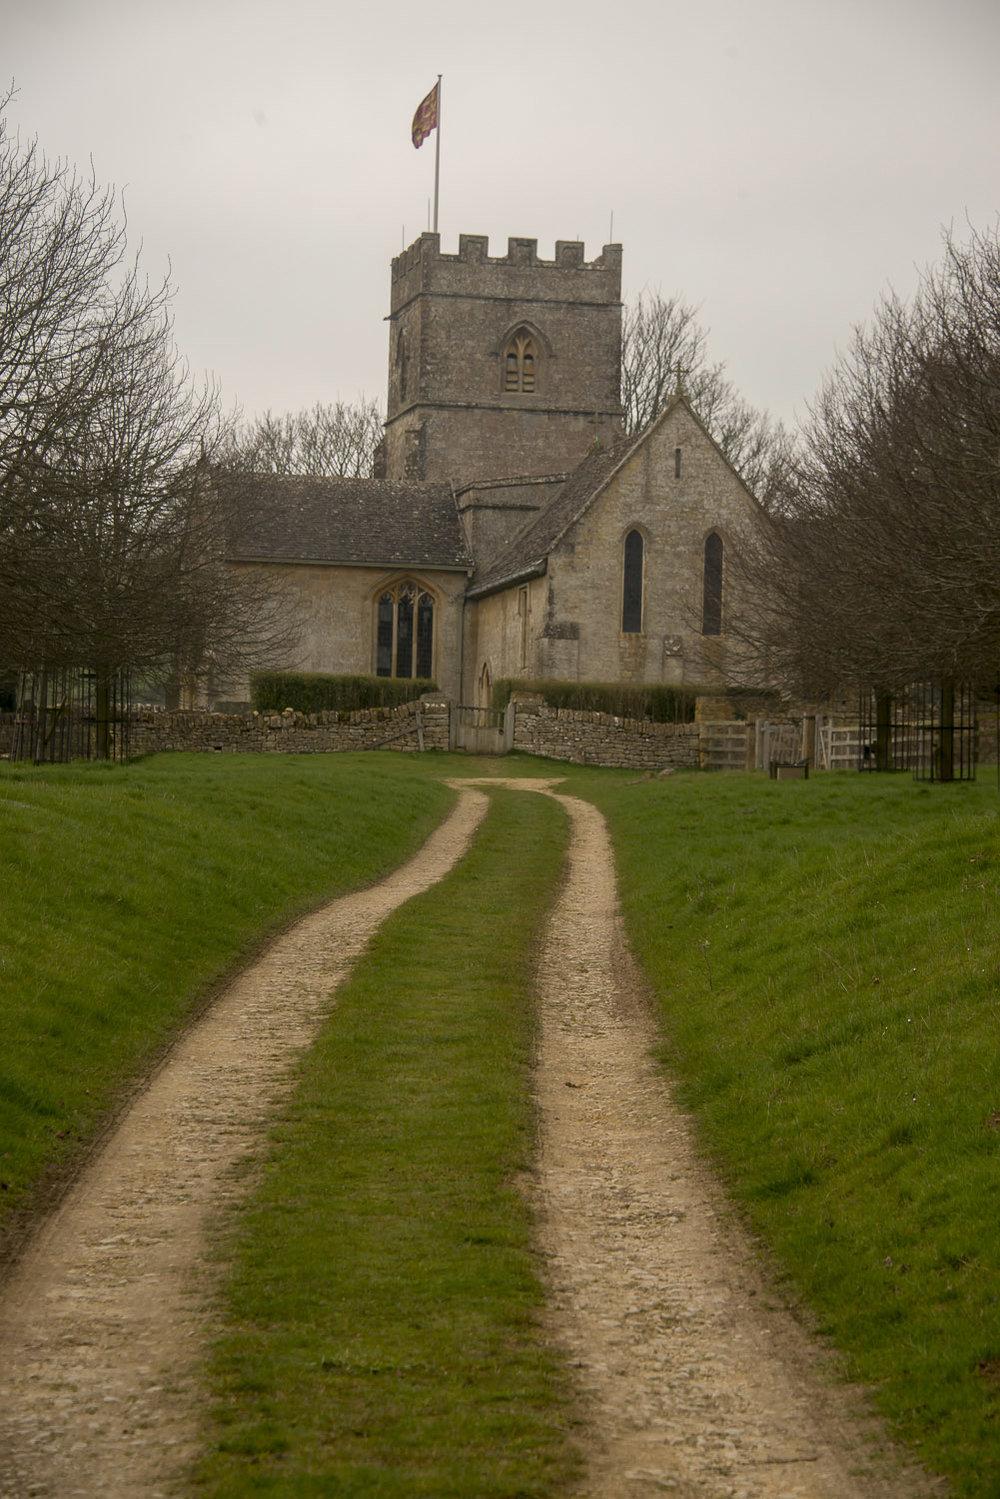 Guiting-Power-church-Gloucestershire-Jo-Kearney-photos-landscape-photography-video-landscapes.jpg